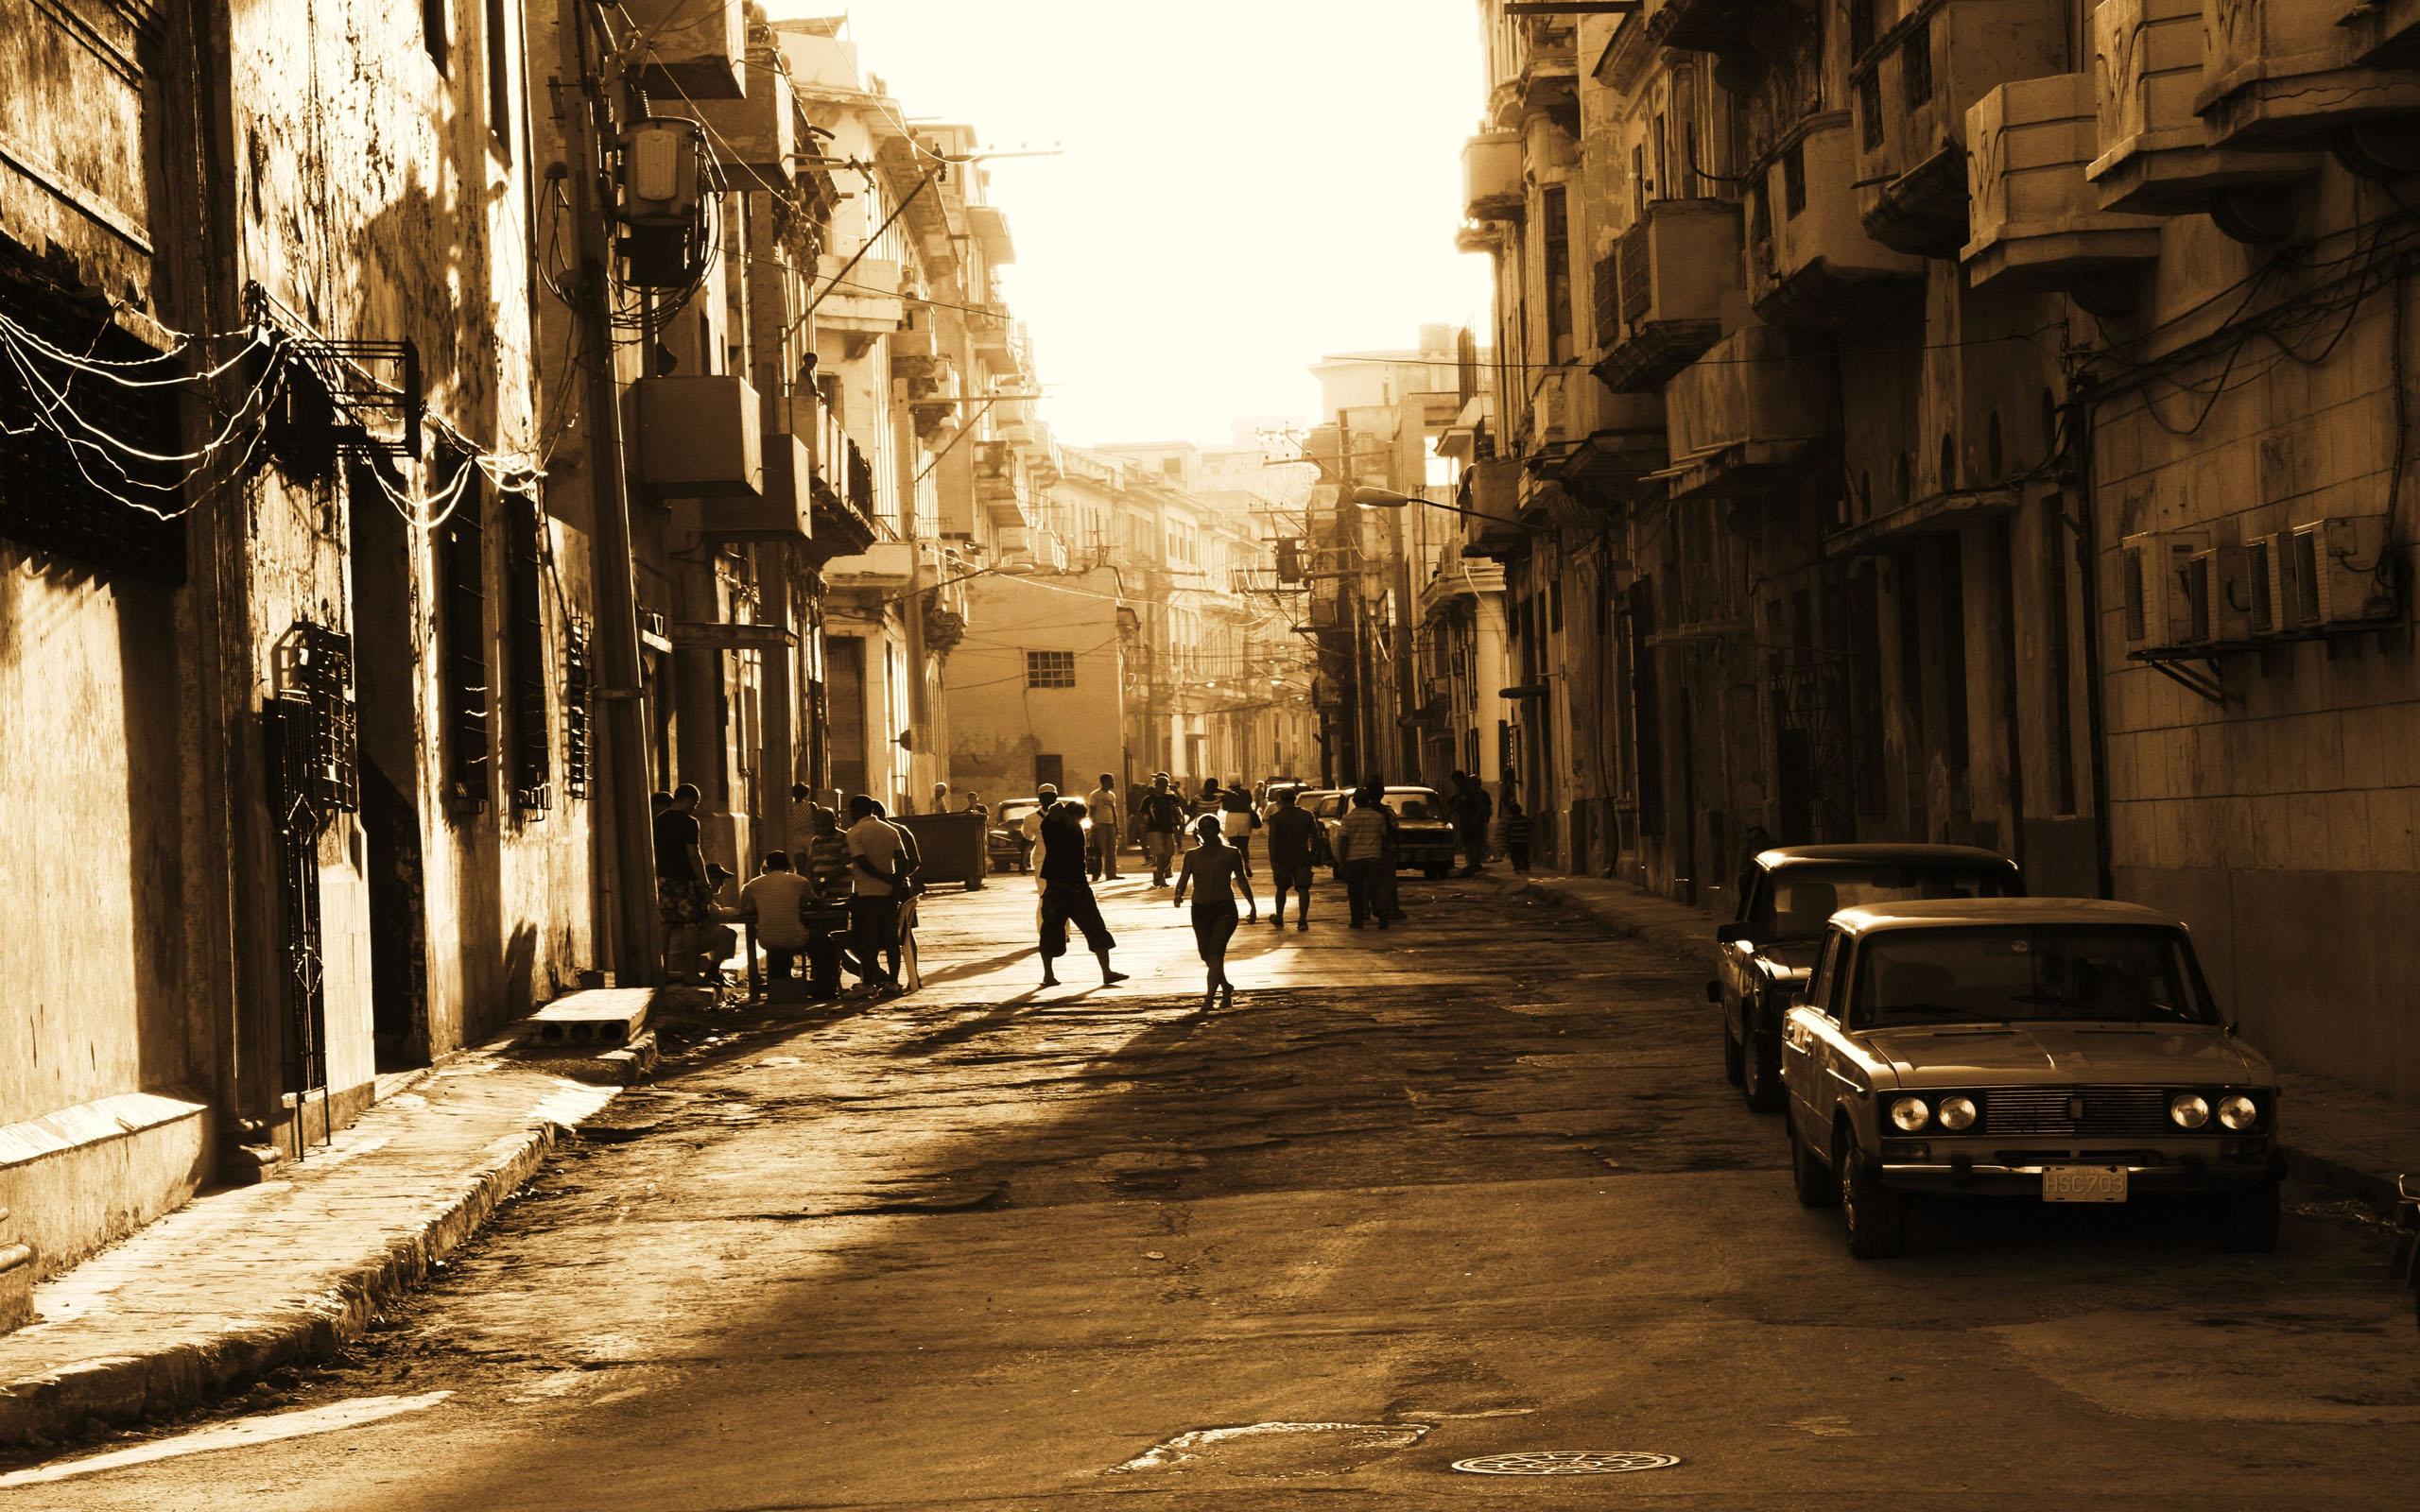 Cuba Wallpaper for Desktop 2560x1600